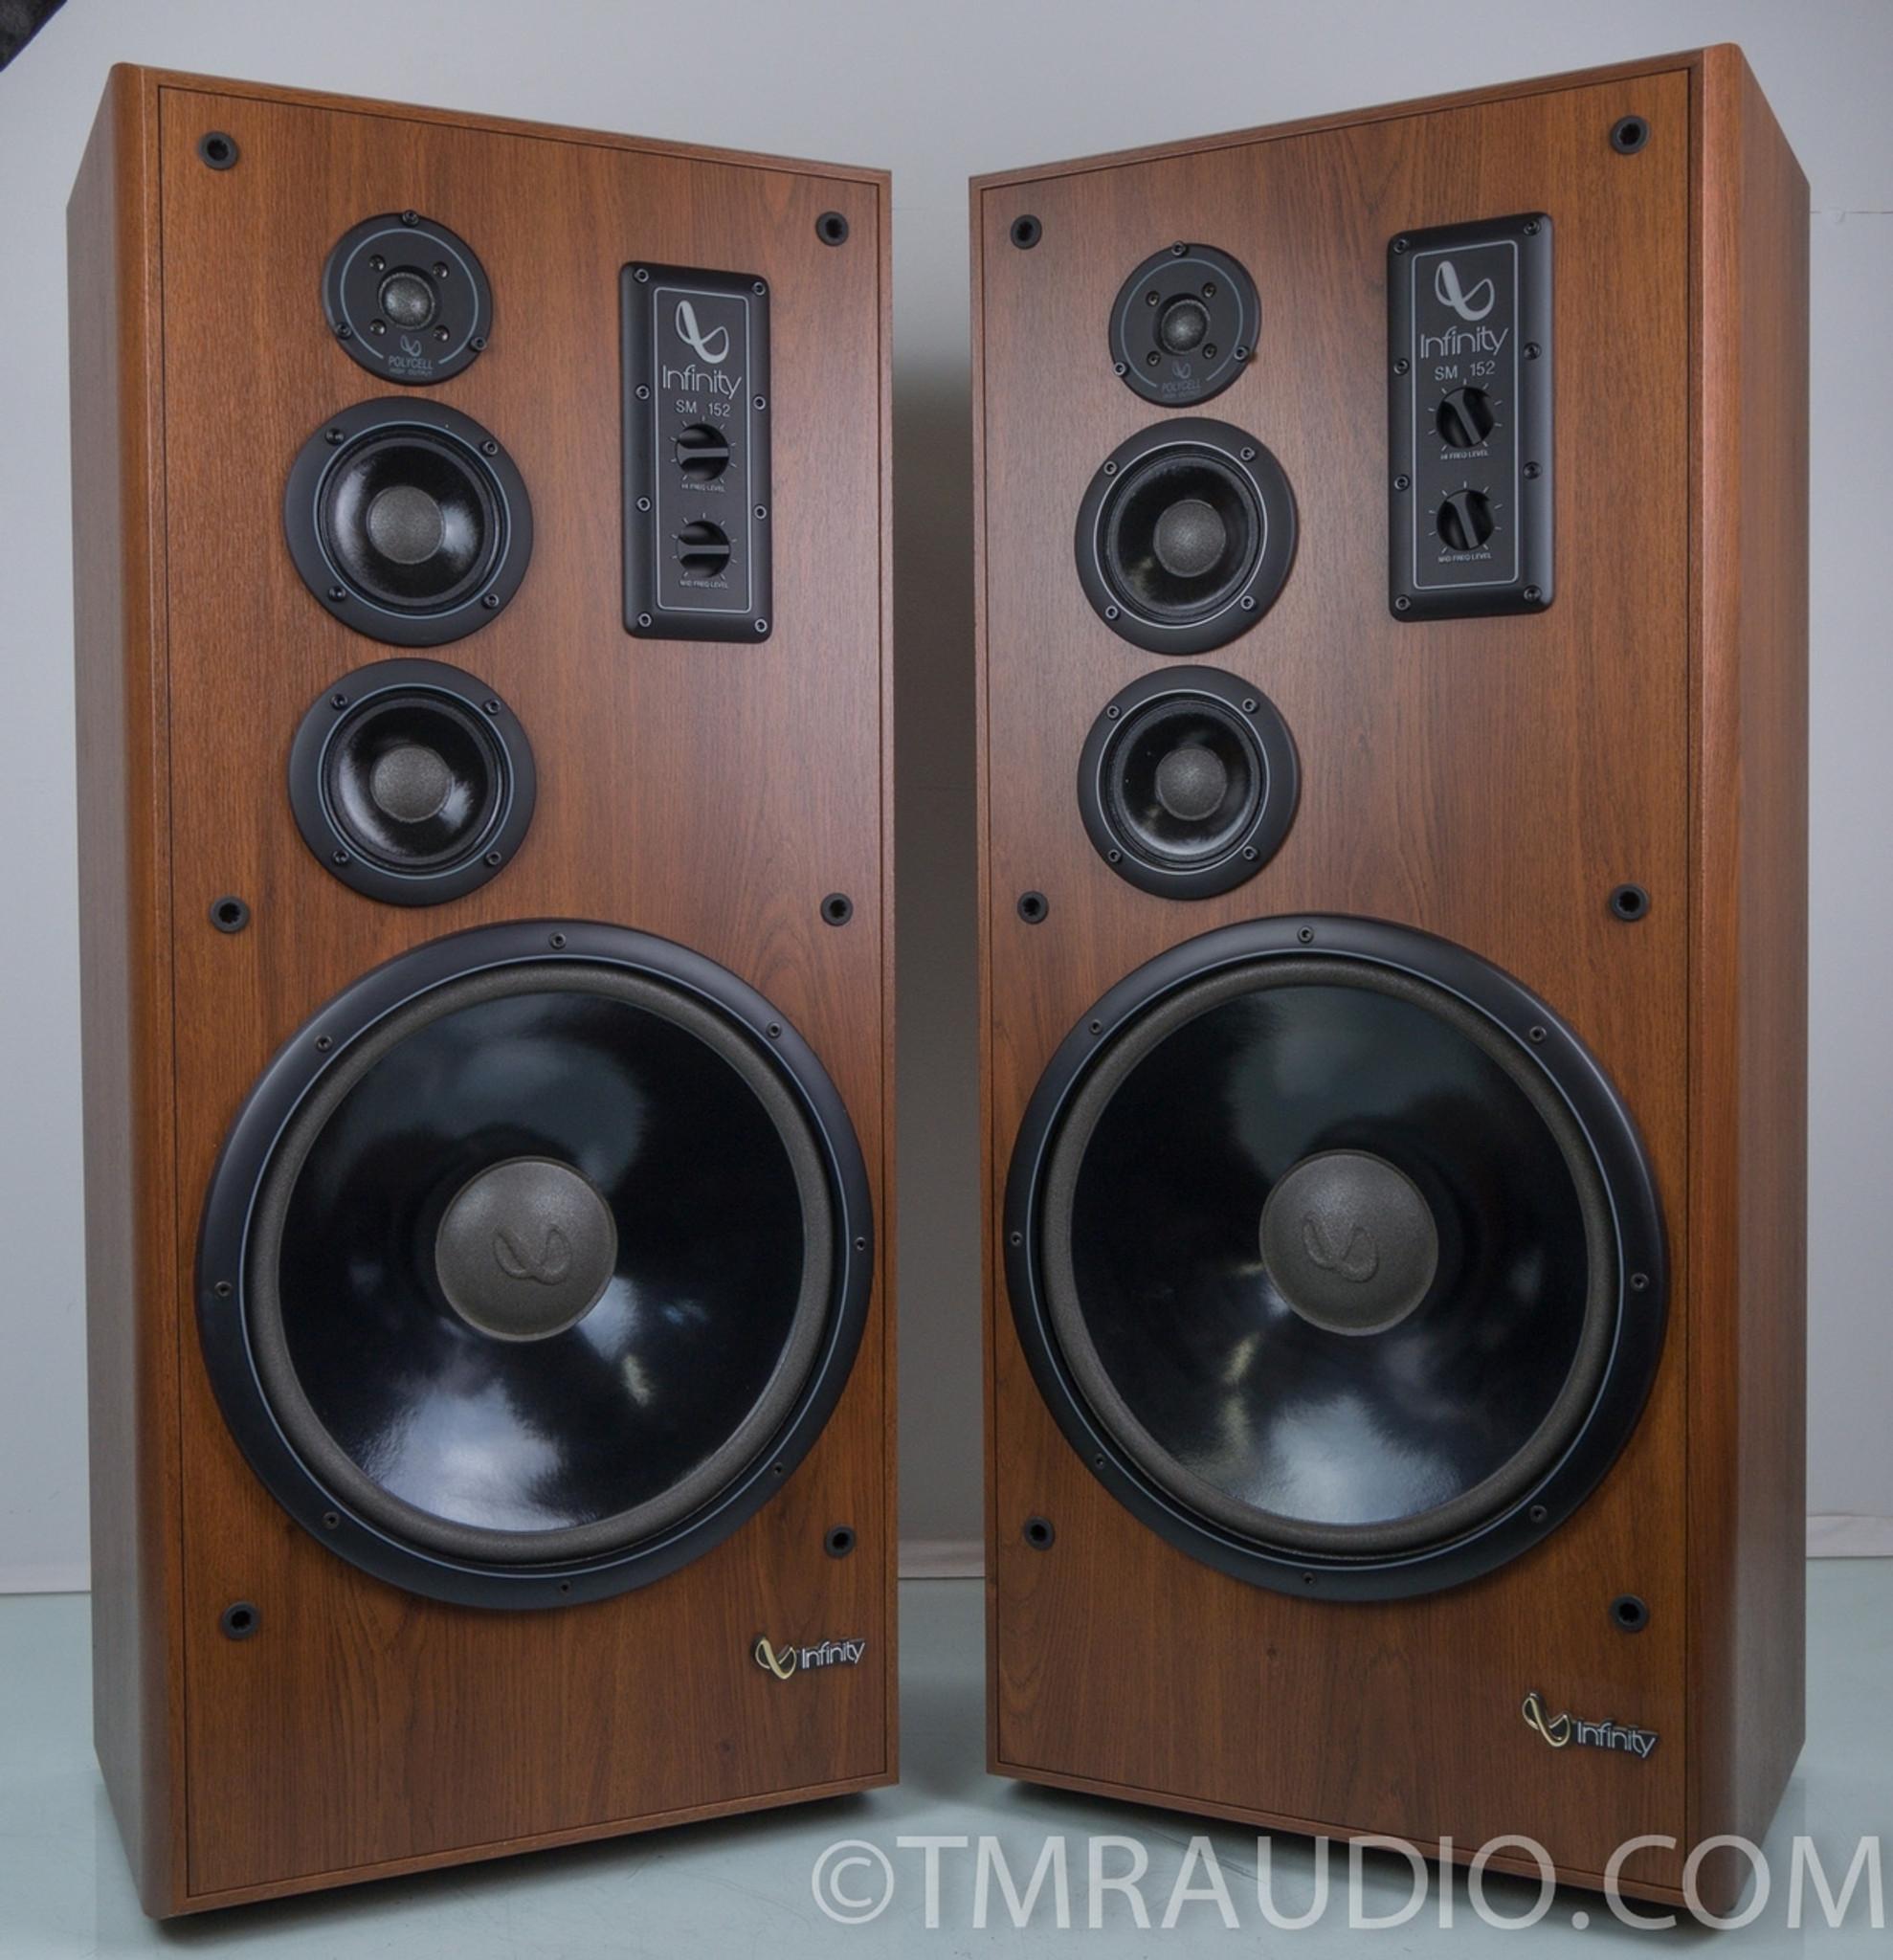 Infinity SM152 Floorstanding Speakers